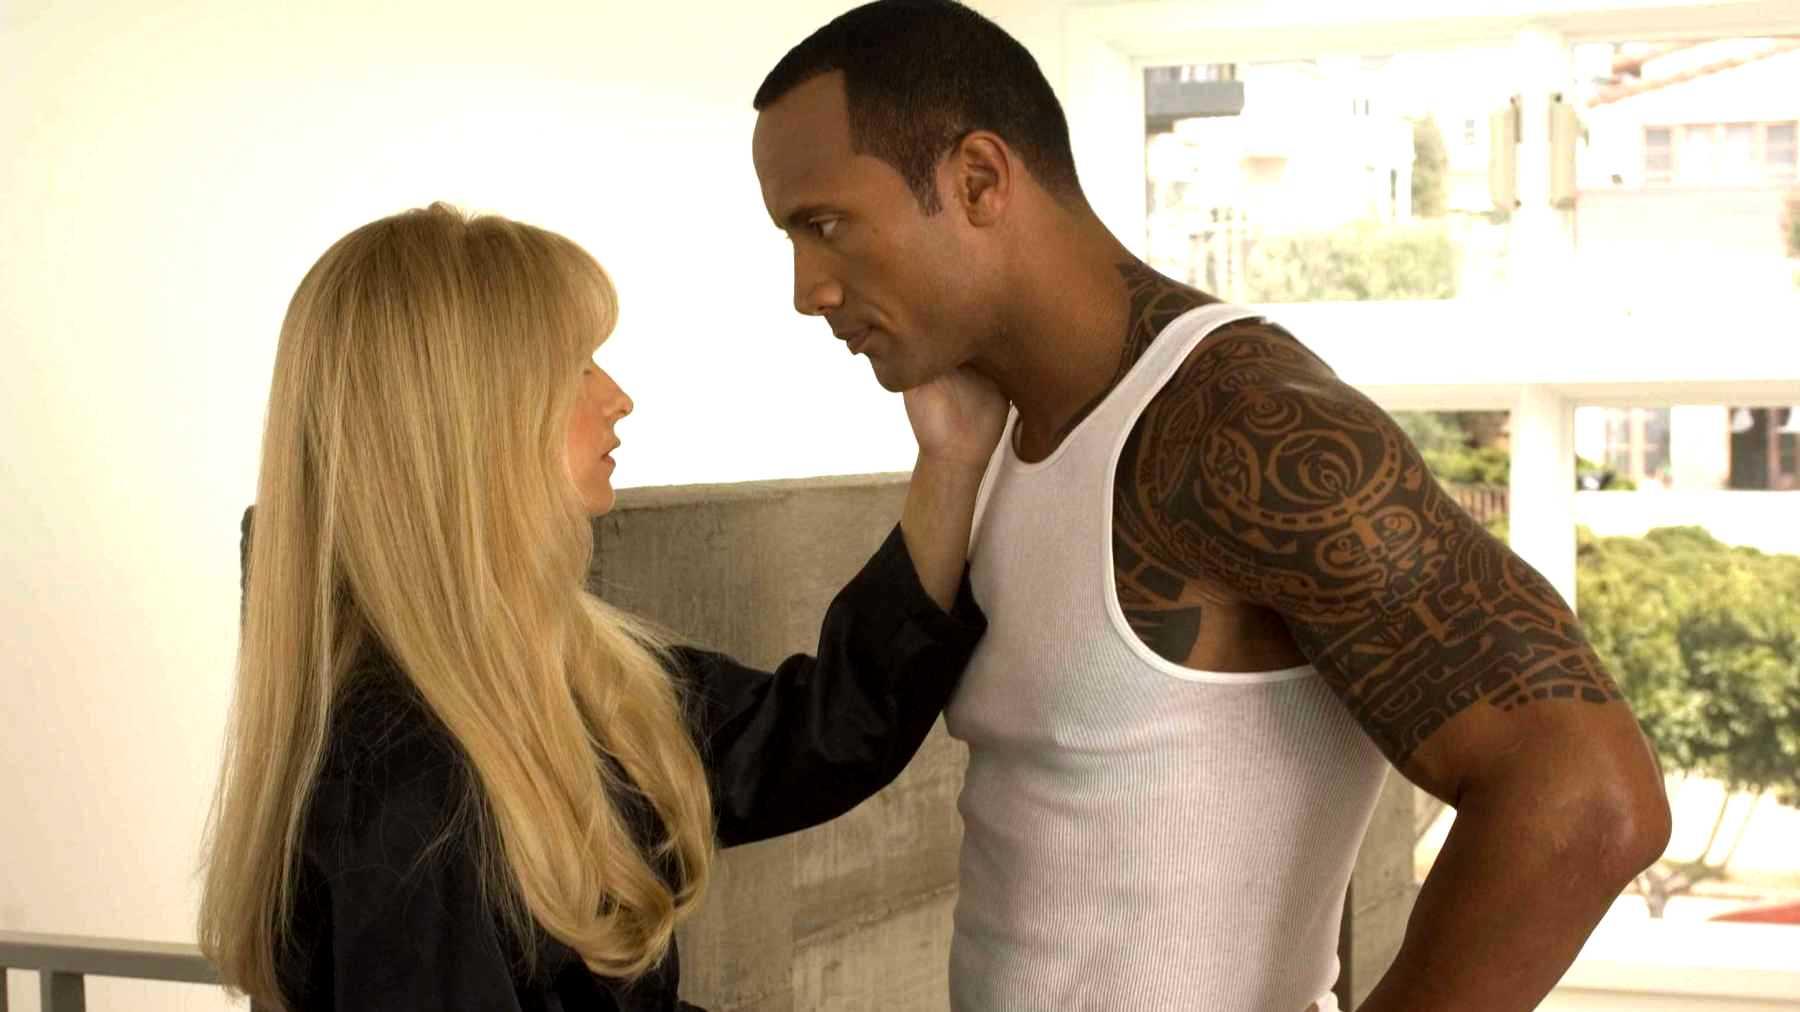 Boxer Santaros (Dwayne Johnson) and Krysta Now (Sarah Michelle Gellar) in Southland Tales (2006)